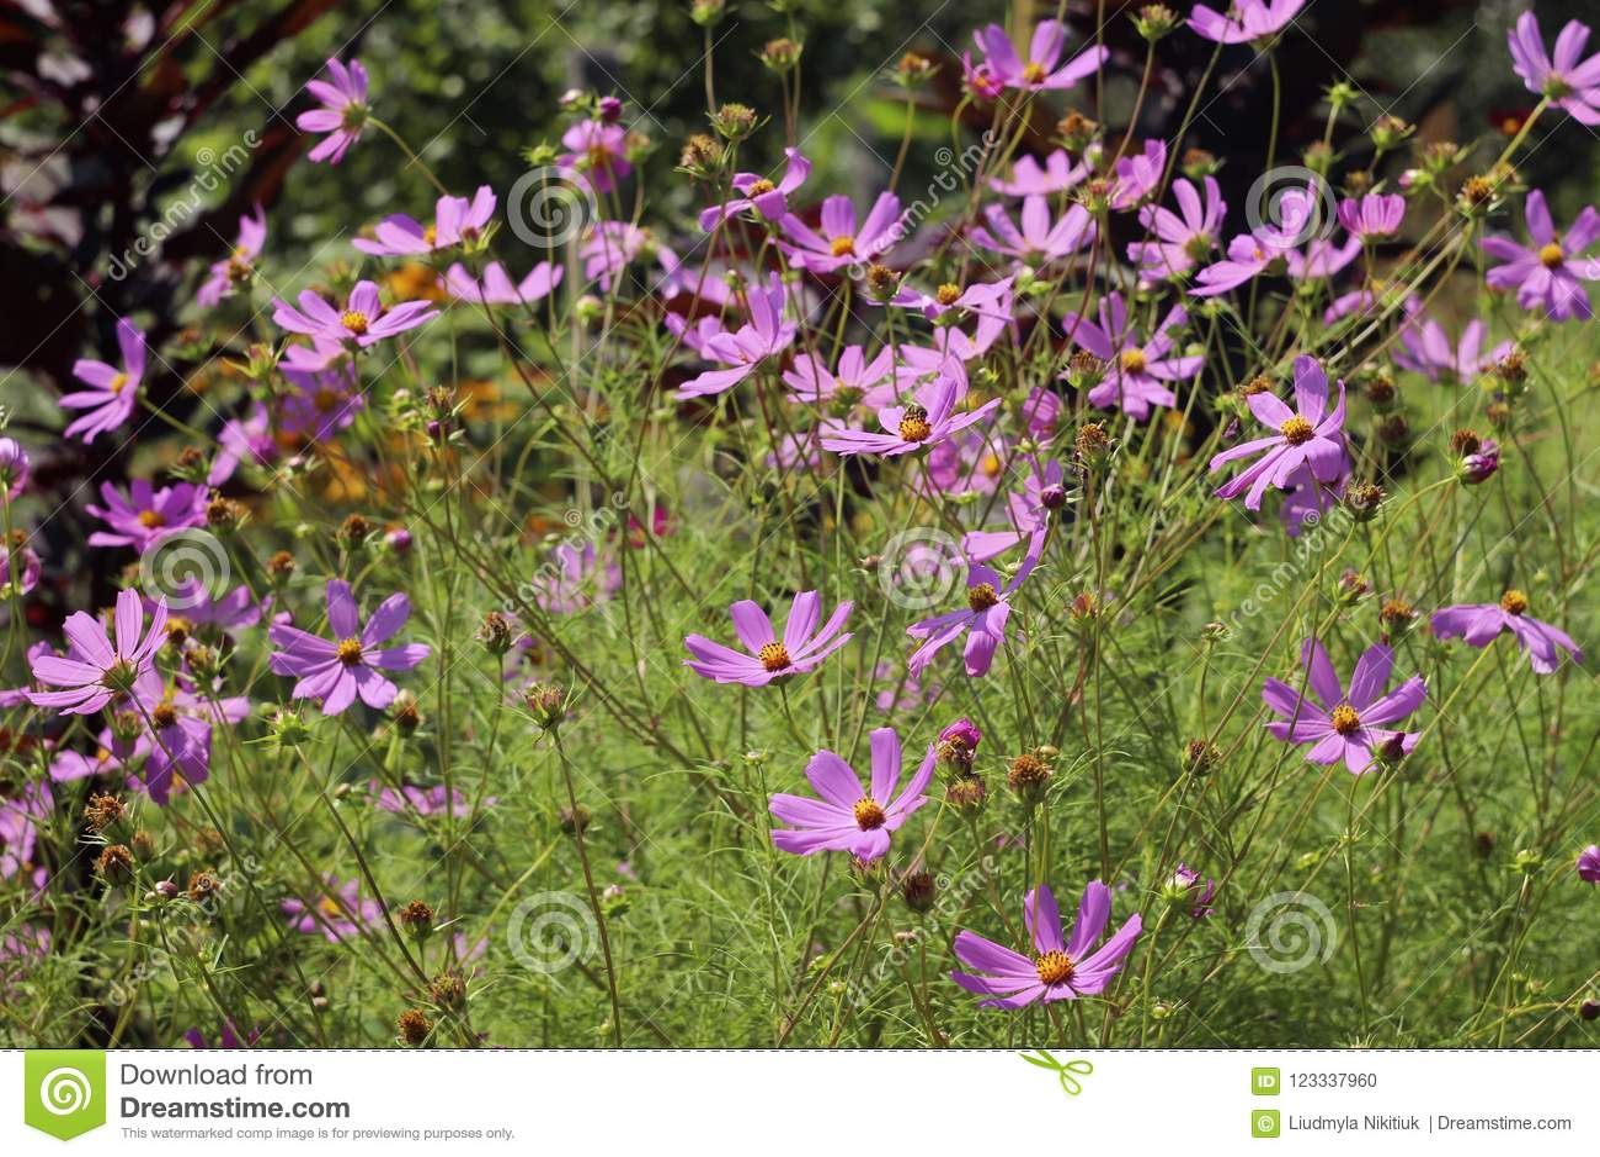 Cosmos flower high pink summer flowers the flowers look like a download cosmos flower high pink summer flowers the flowers look like a daisy stock izmirmasajfo